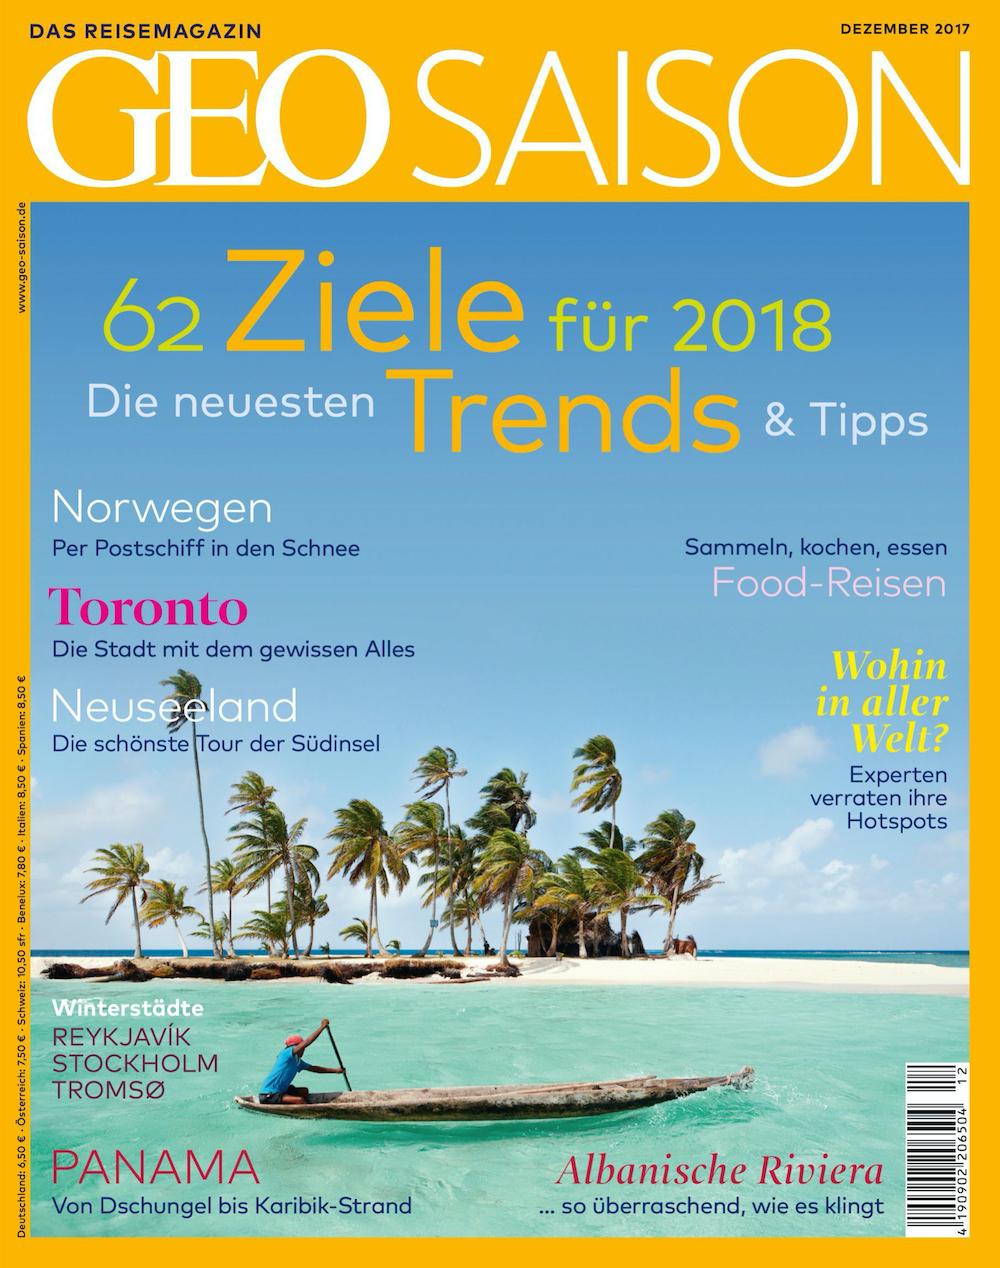 GEO Saison 2017-12